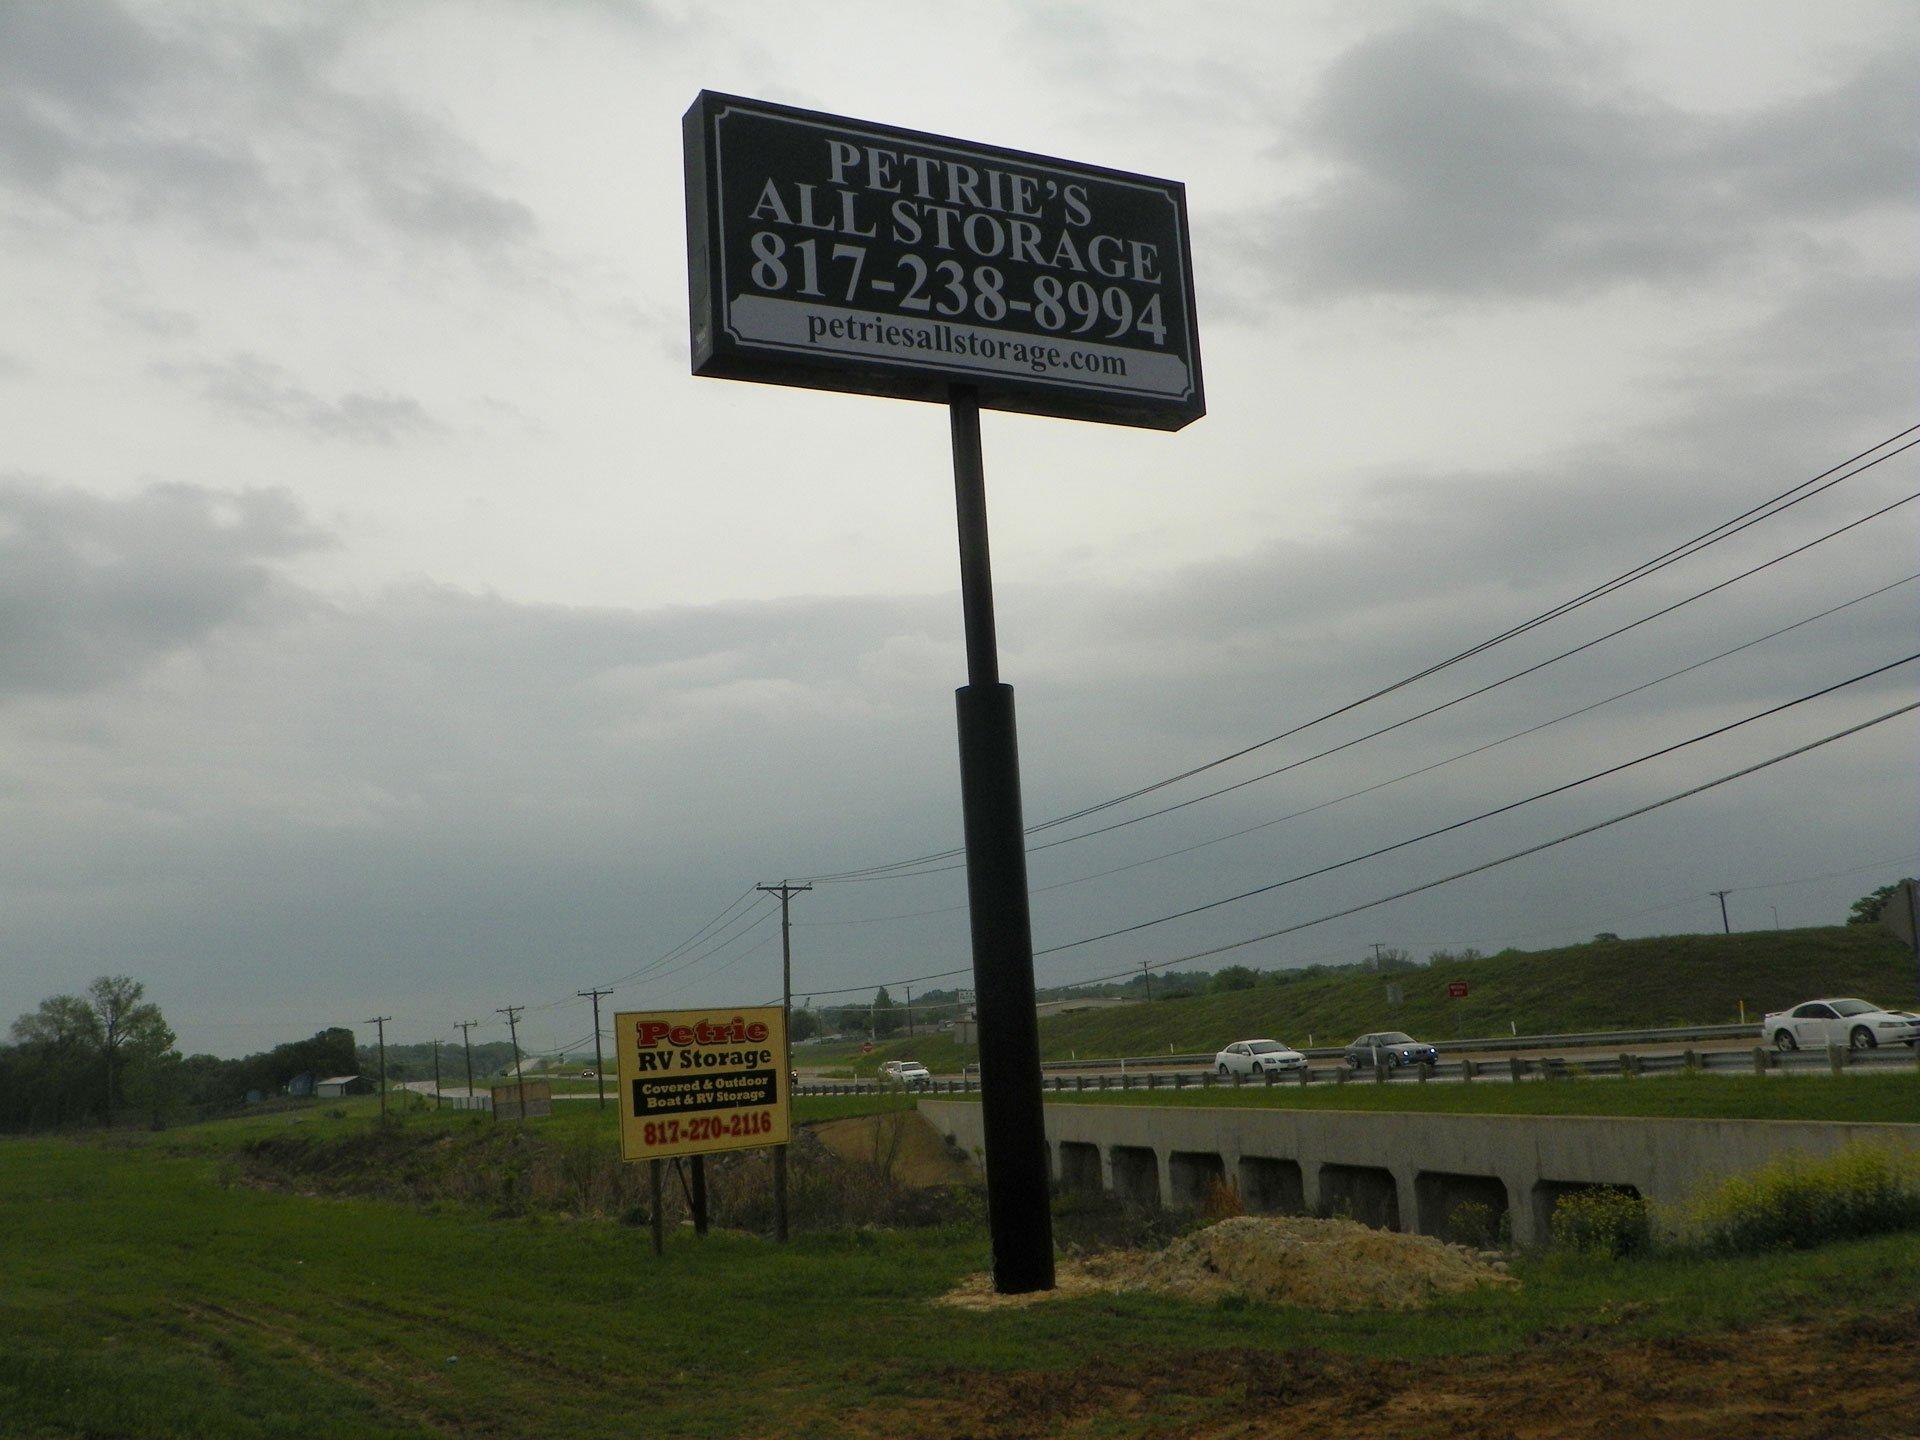 Pete's Autosale Sign